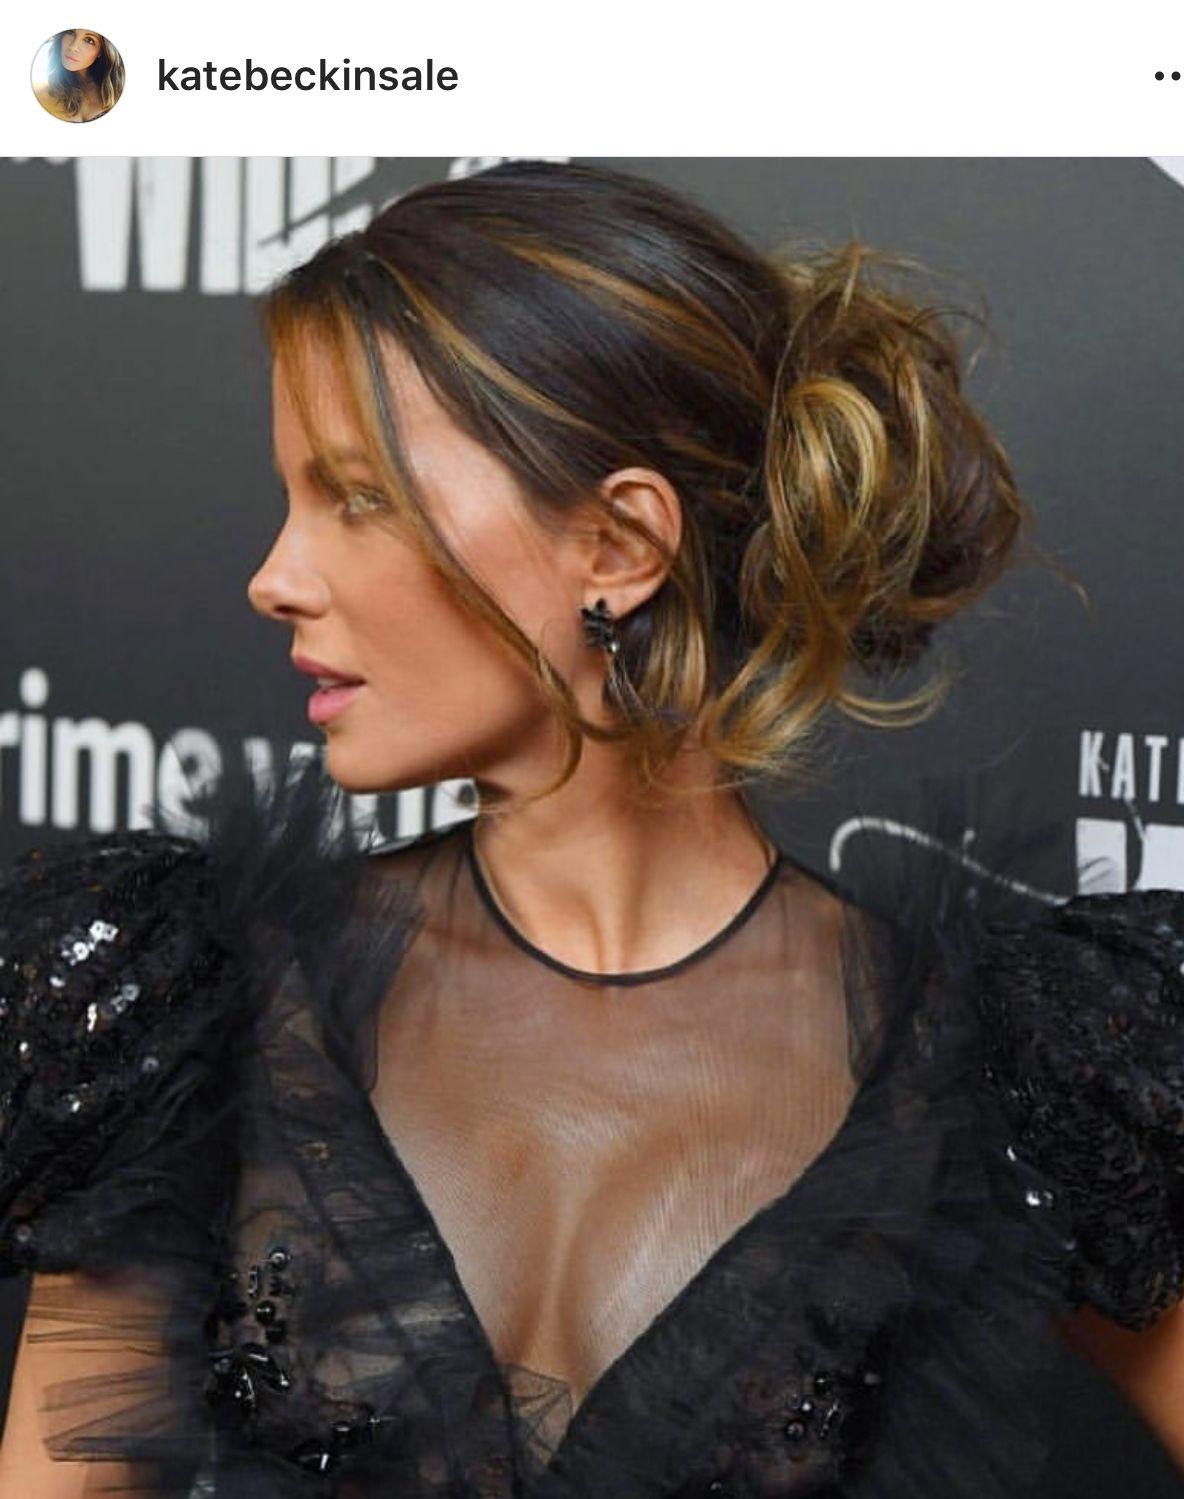 Amanda Bynes Immagini pinroy dean dye on kate beckinsale in 2019 | kate